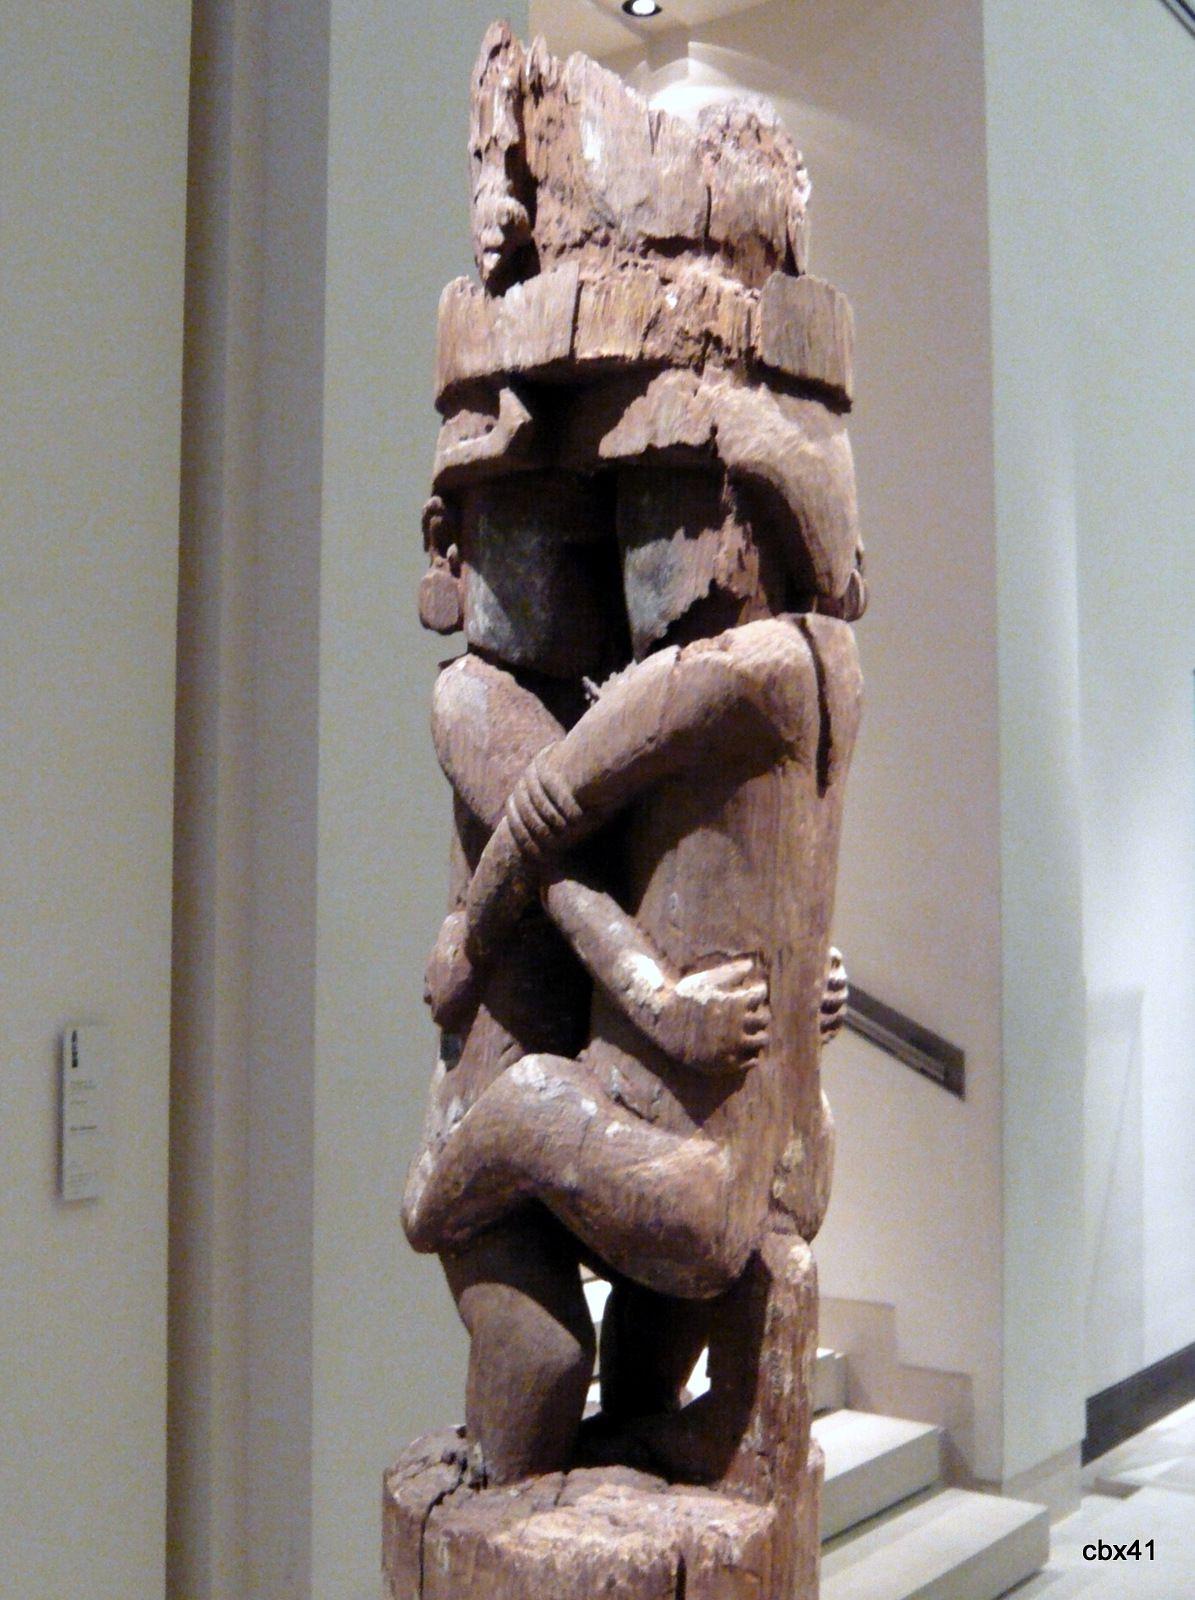 Sculpture de l'île de Makira, Iles Salomon